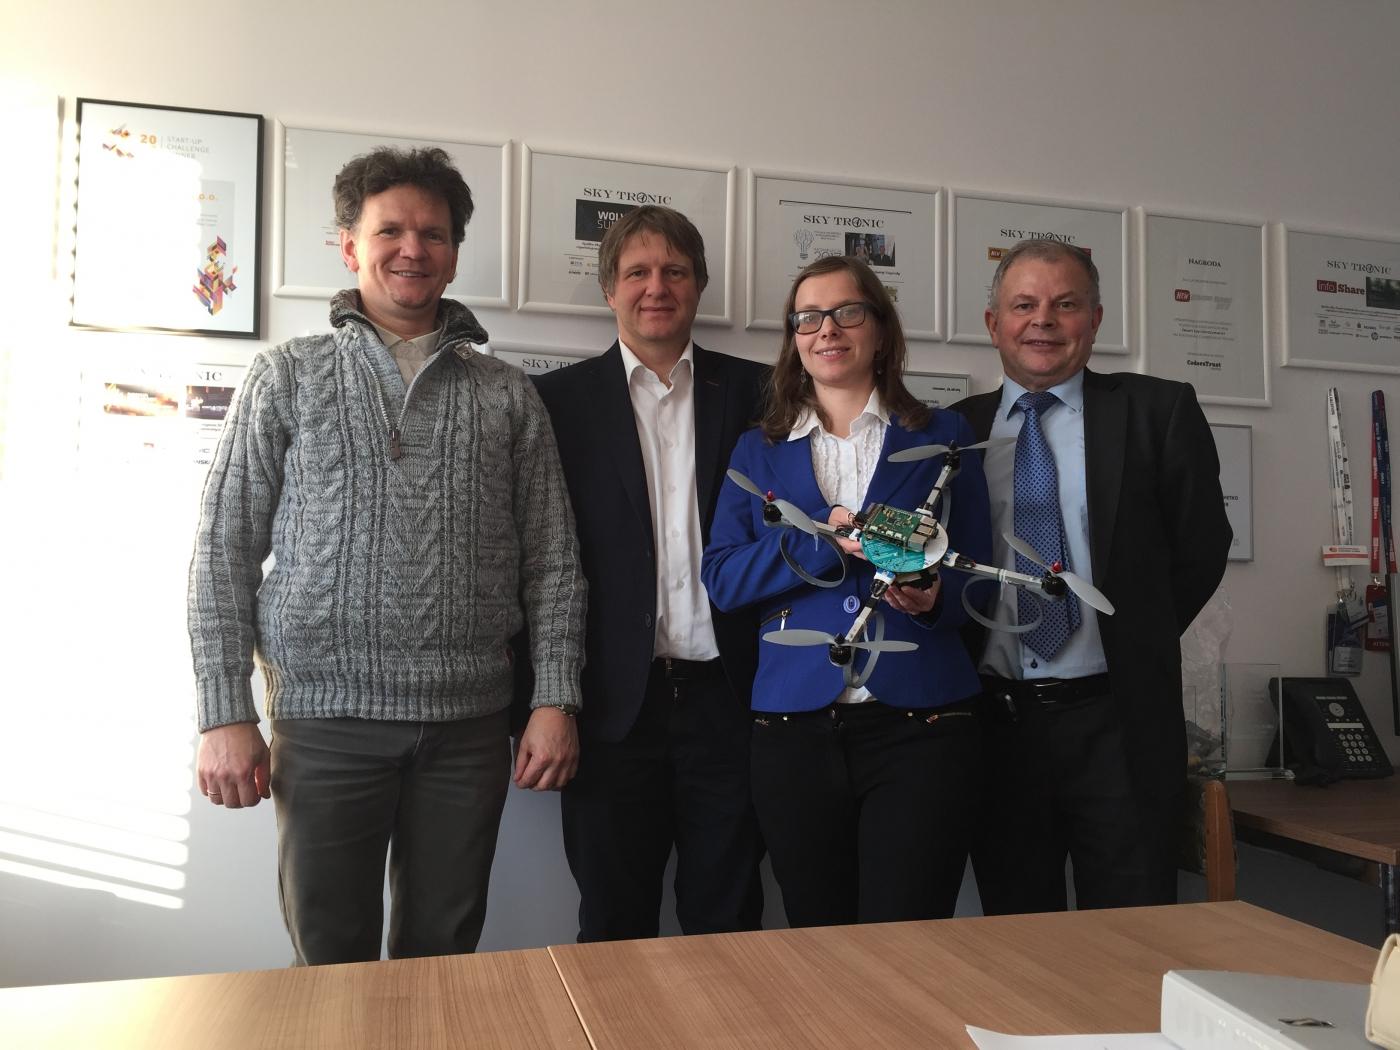 Jak dvoje naukovciv z Vroclava rozpočaly revoljuciju na rynku droniv